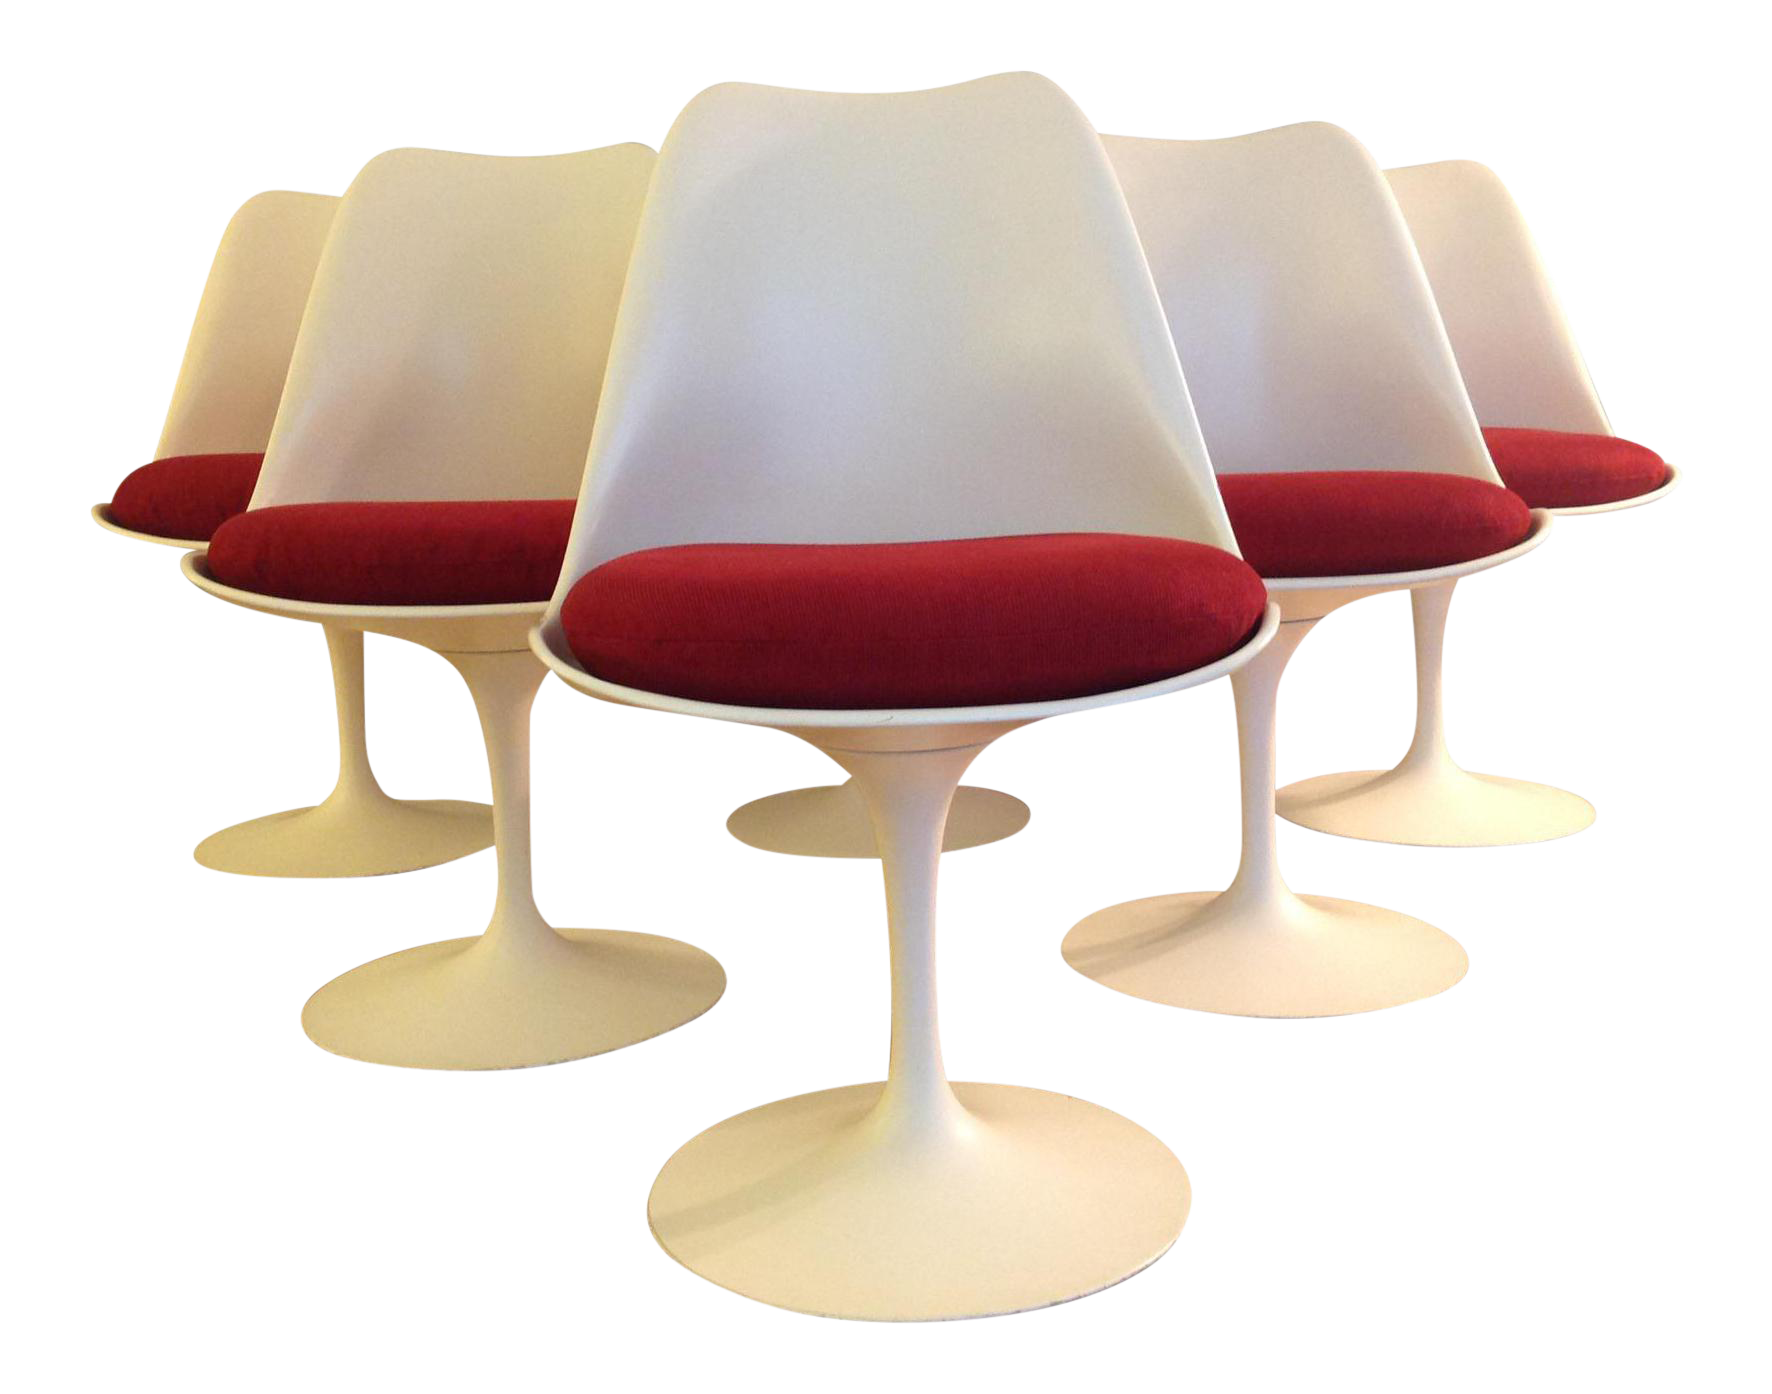 Eero Saarinen Tulip Dining Chairs for Knoll Set of 8